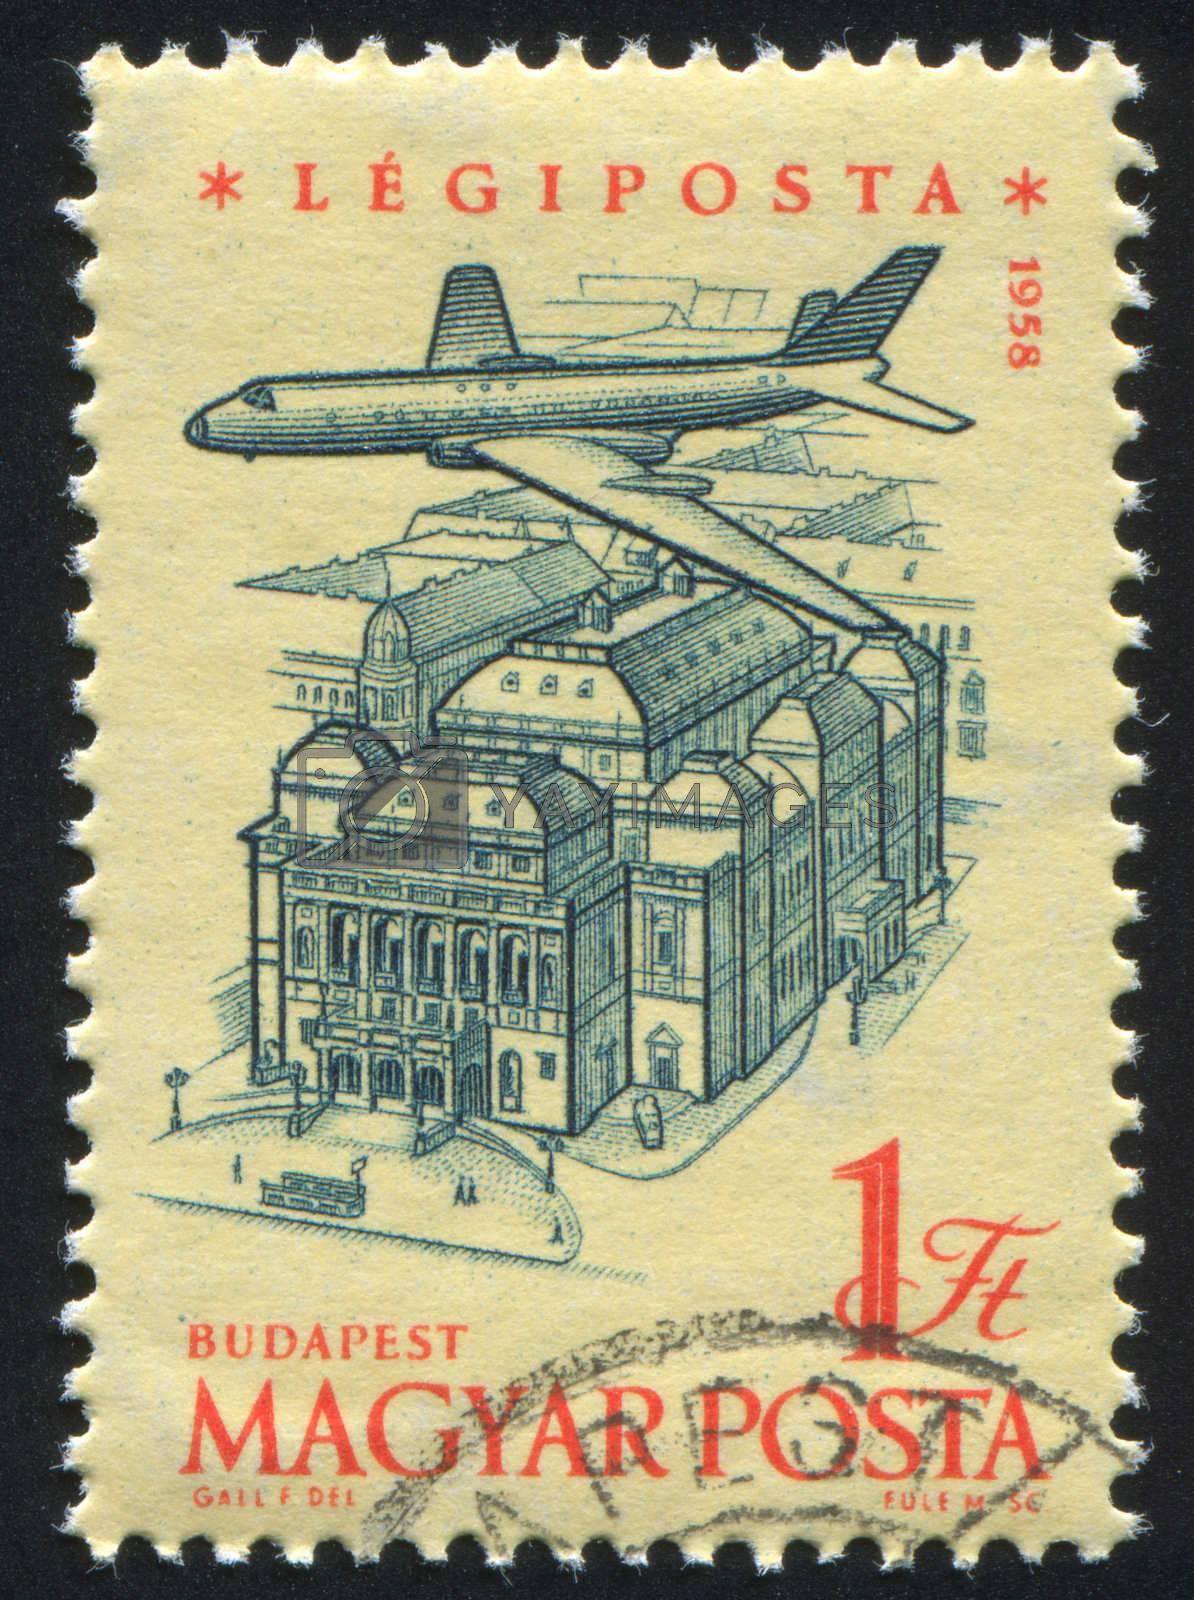 HUNGARY - CIRCA 1958: stamp printed by Hungary, shows Plane over Budapest, Opera House, circa 1958